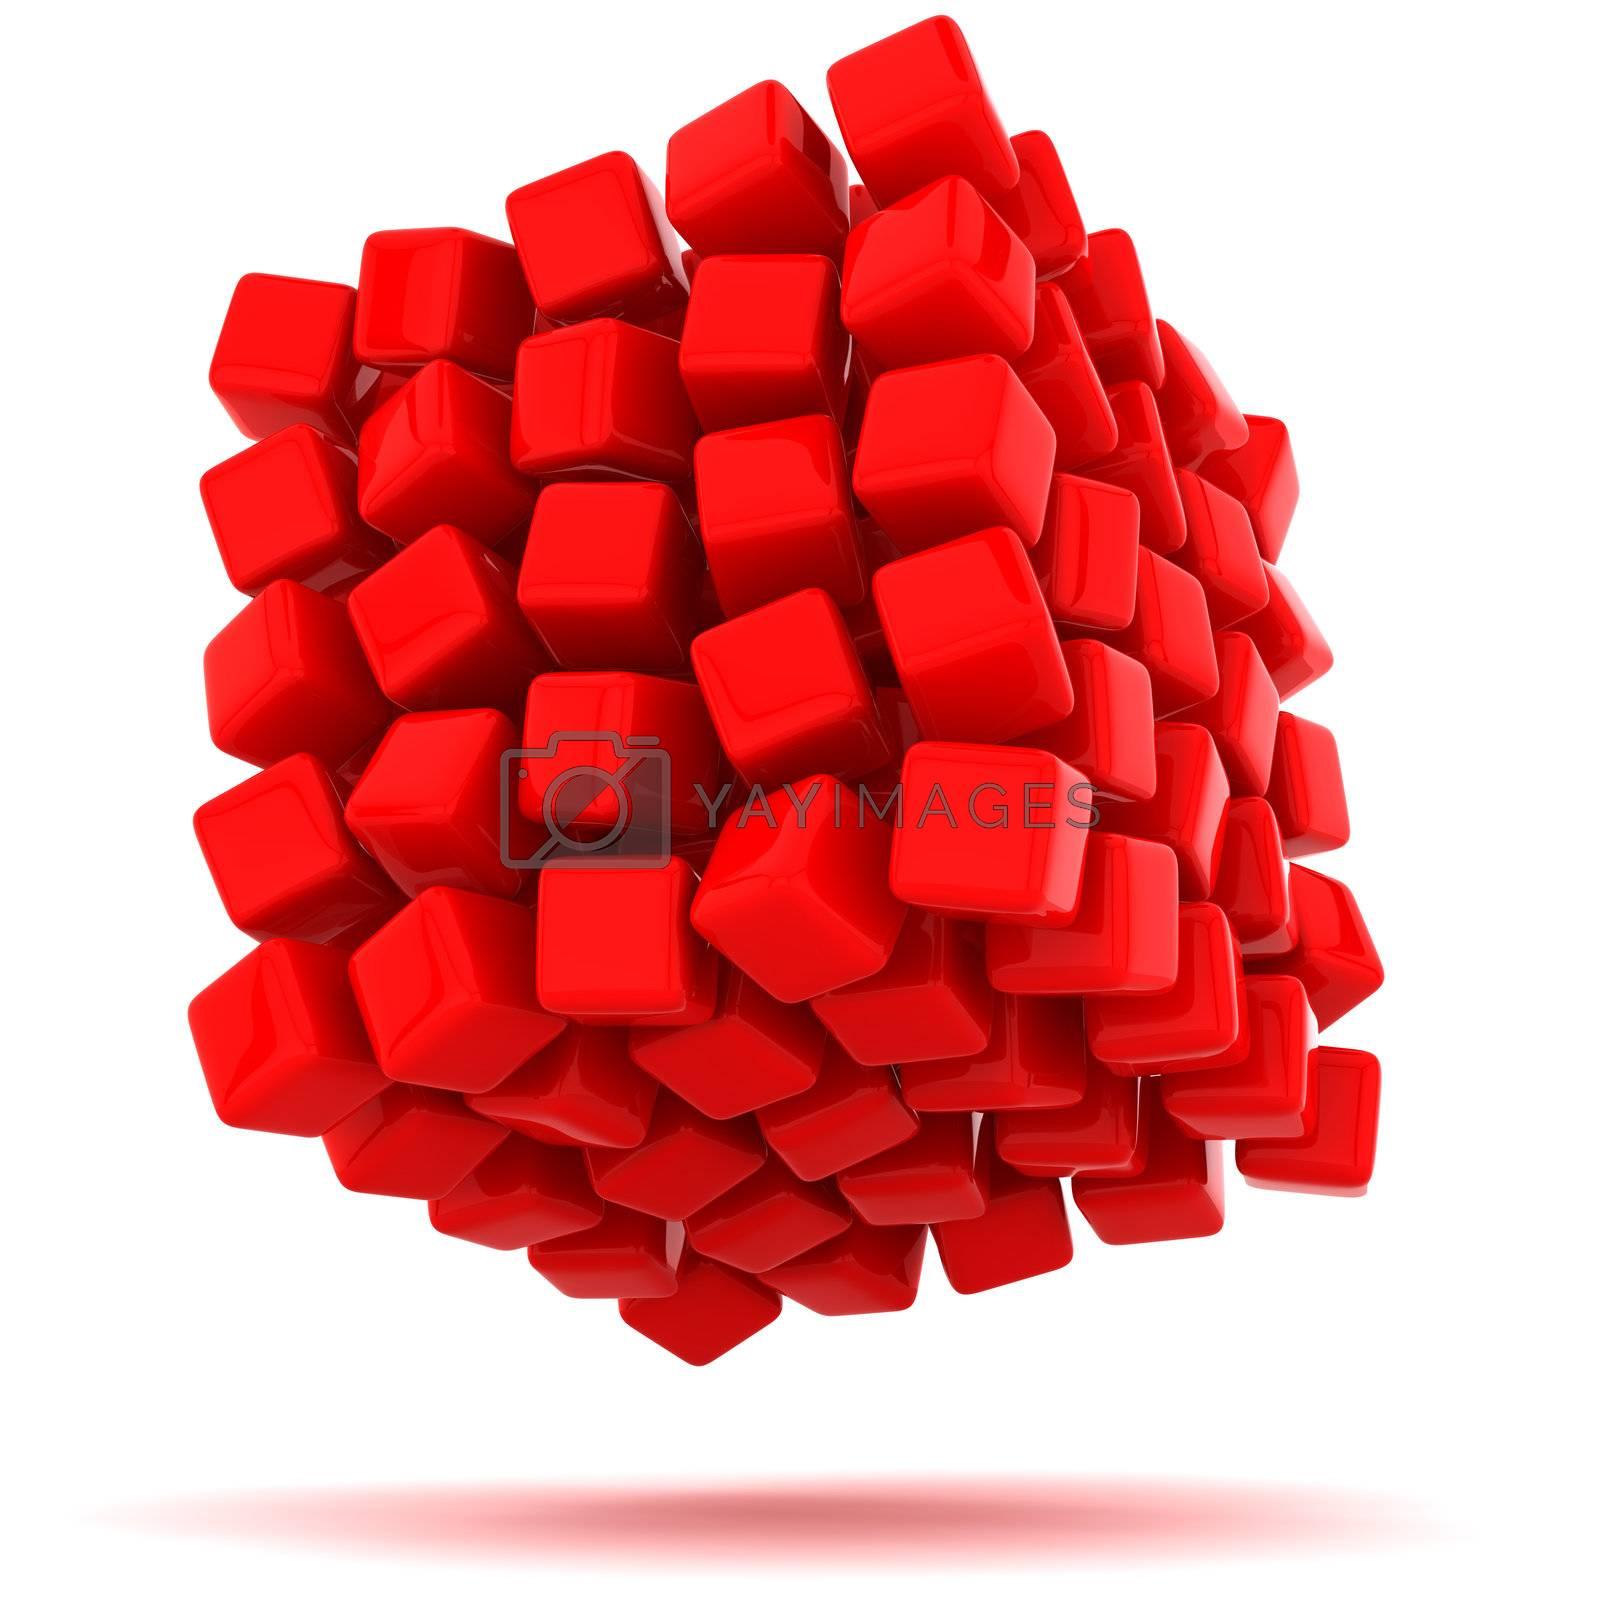 Big red cube falling apart